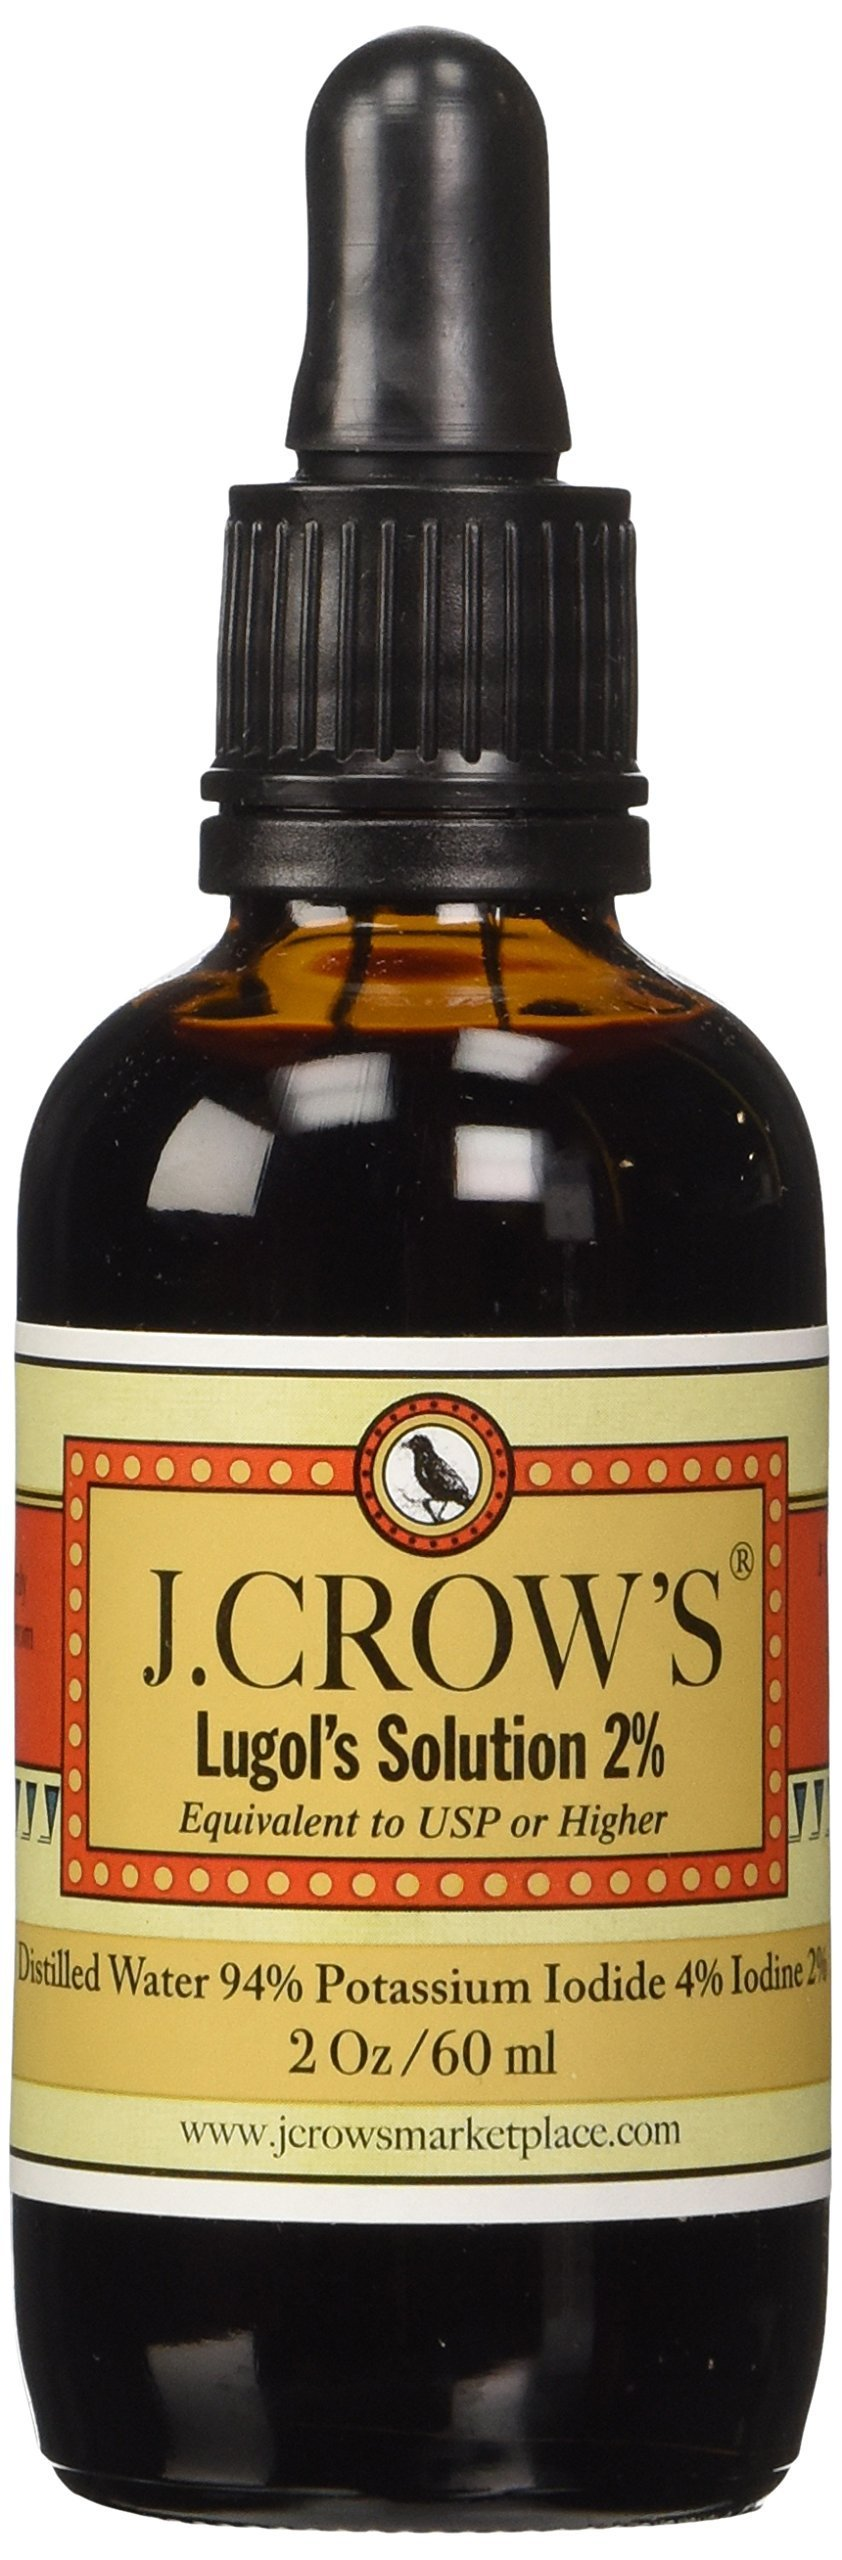 J.Crow's Lugol's Iodine Solution, 2 oz., Twin Pack (2 Bot.)